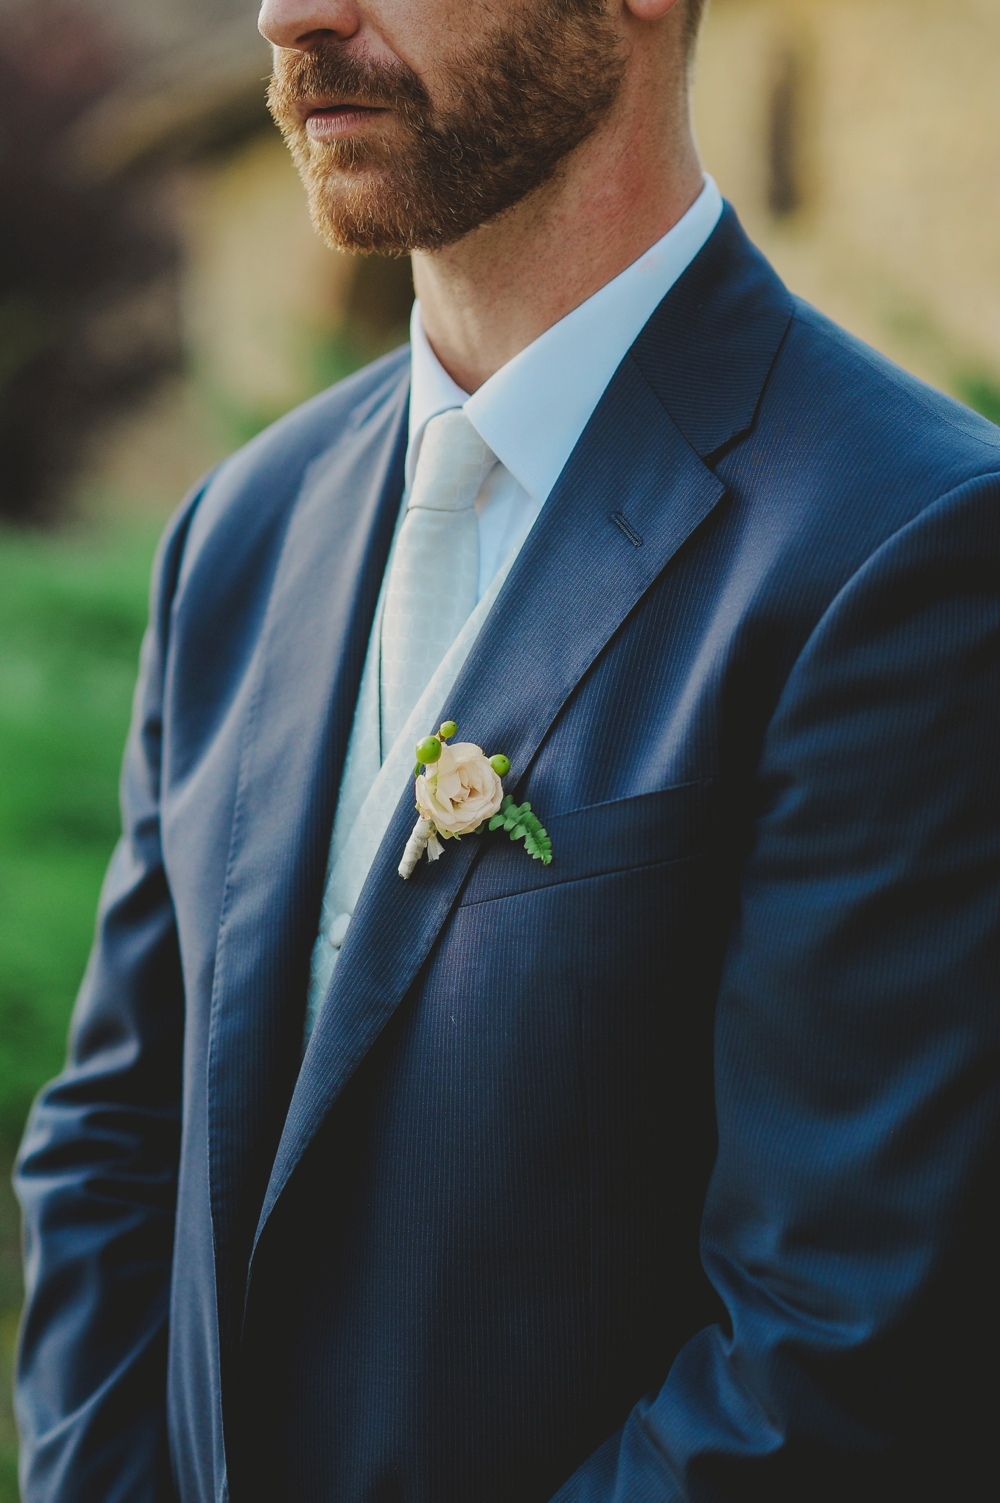 Gloria_Umberto_Landvphotography_wedding_borgodellarocca_0132.jpg